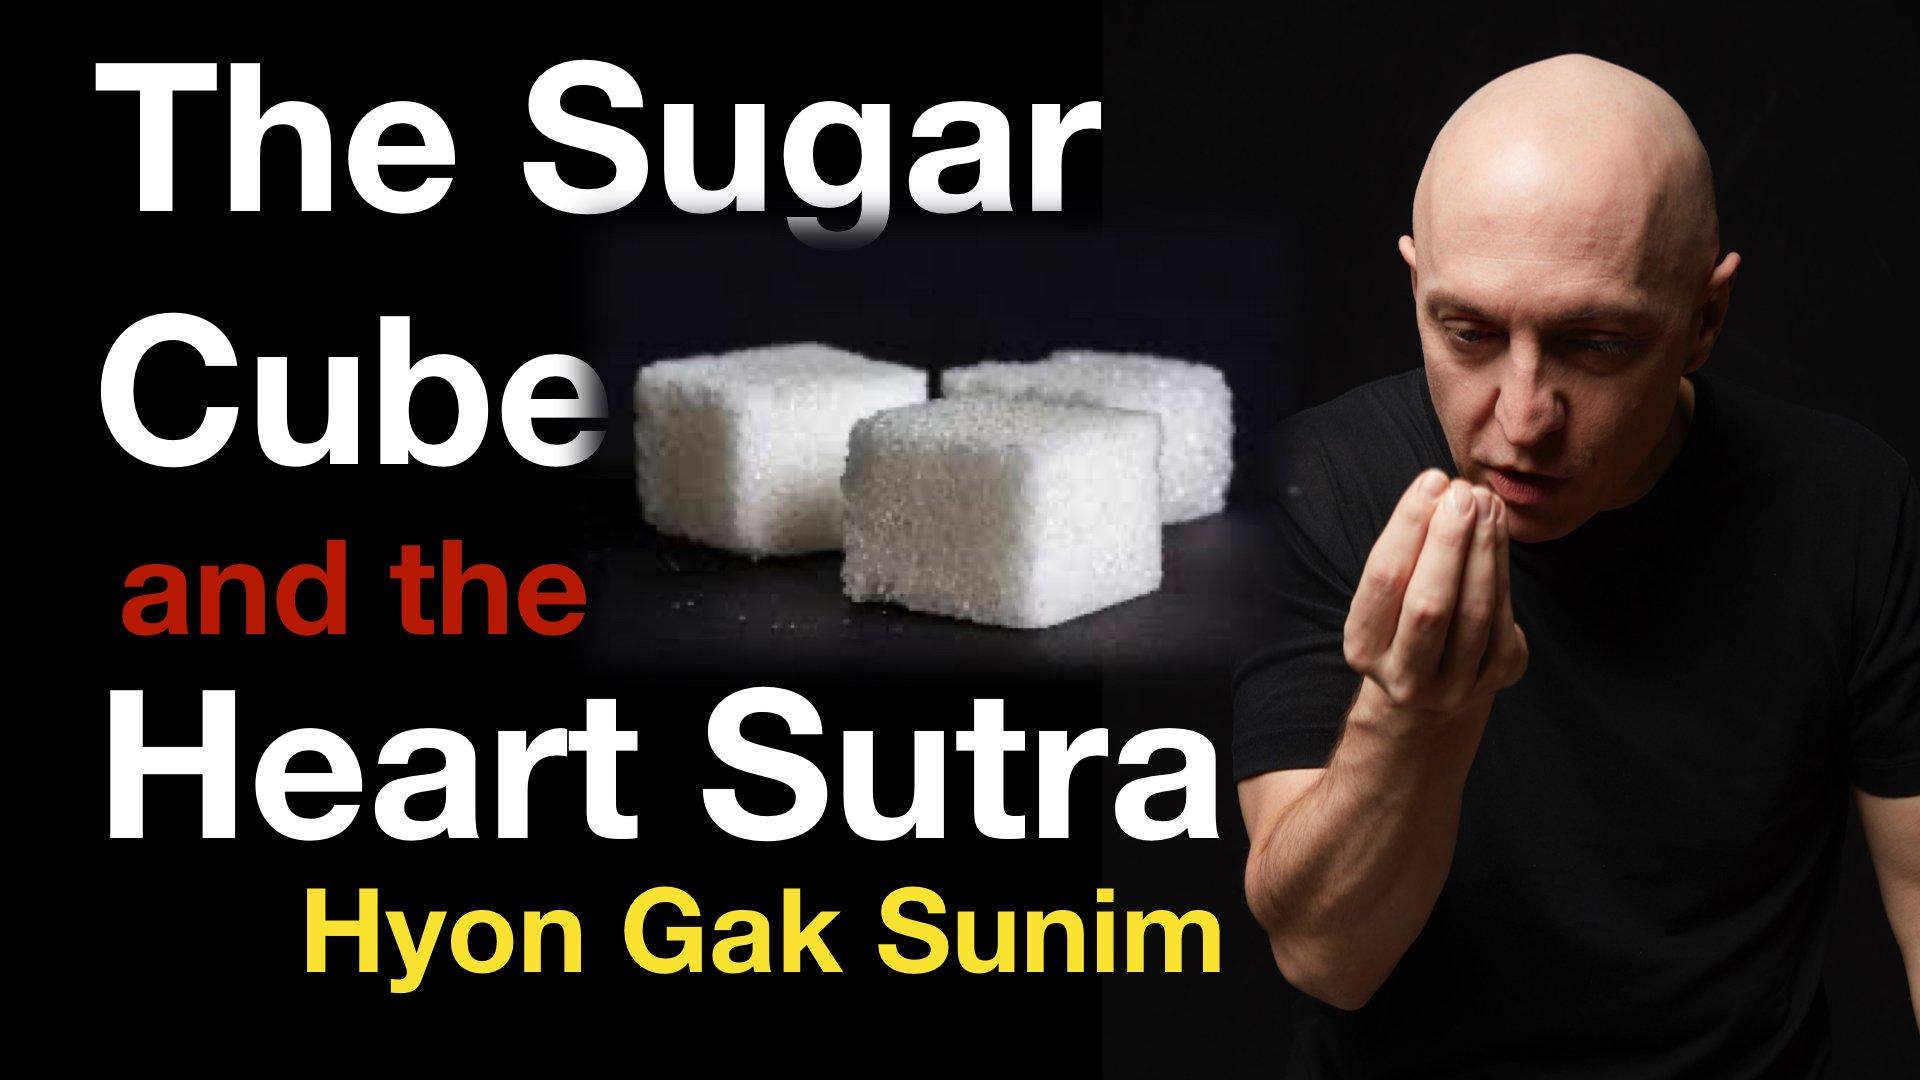 2 THUMBNAIL - Sugar Cube 2.001